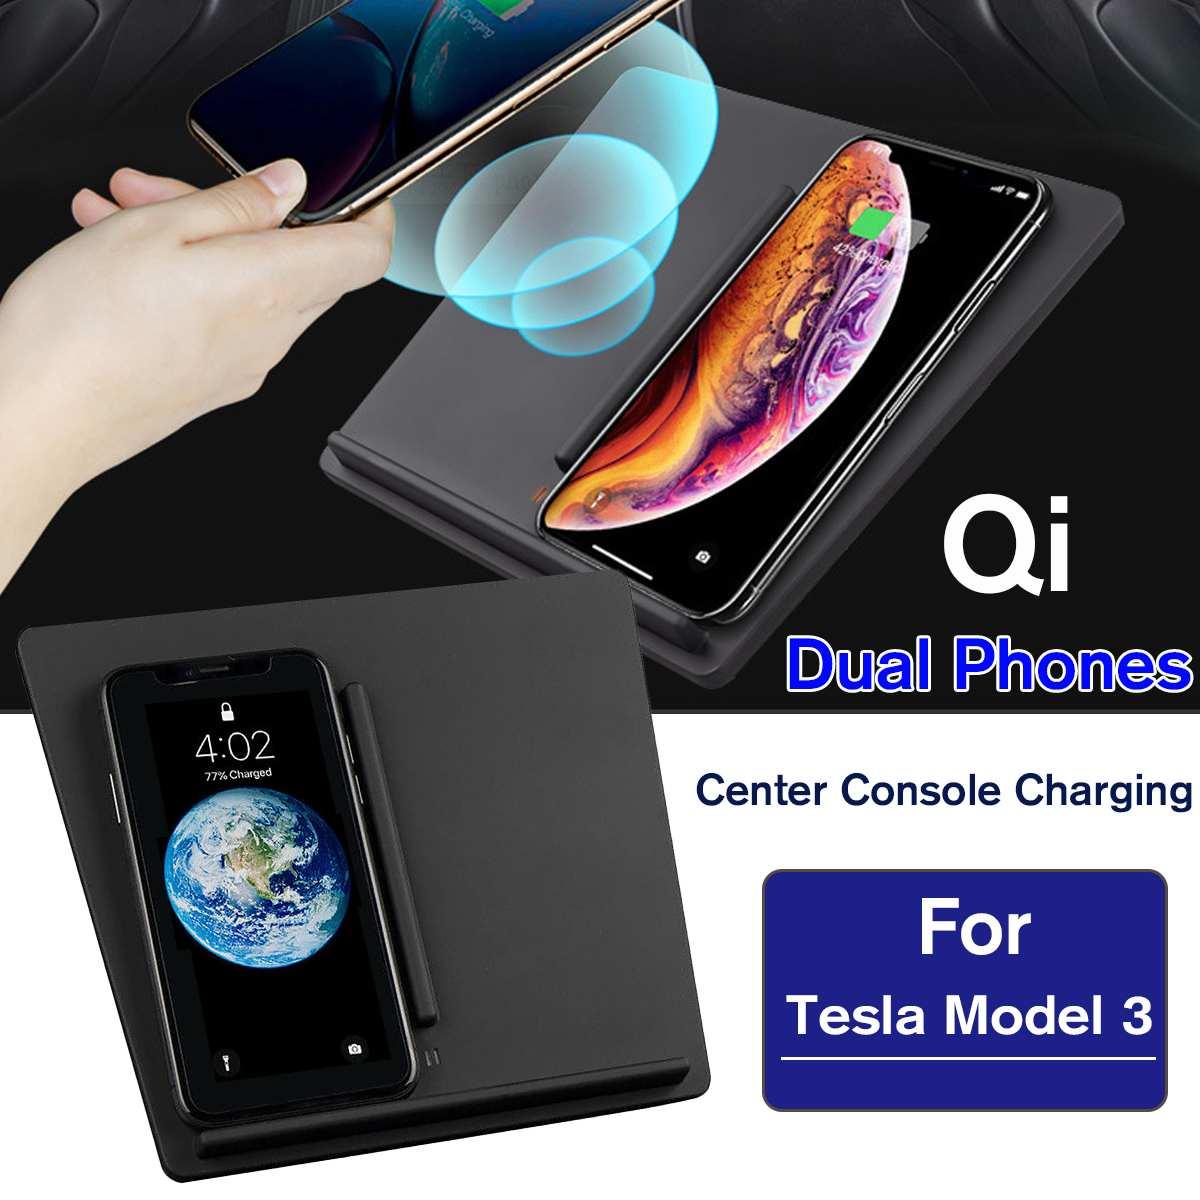 Wireless Phone Device Charging Dock Center Console Charger for Tesla Model 3 Wireless Phone Device Charging Dock Center Console Charger for Tesla Model 3